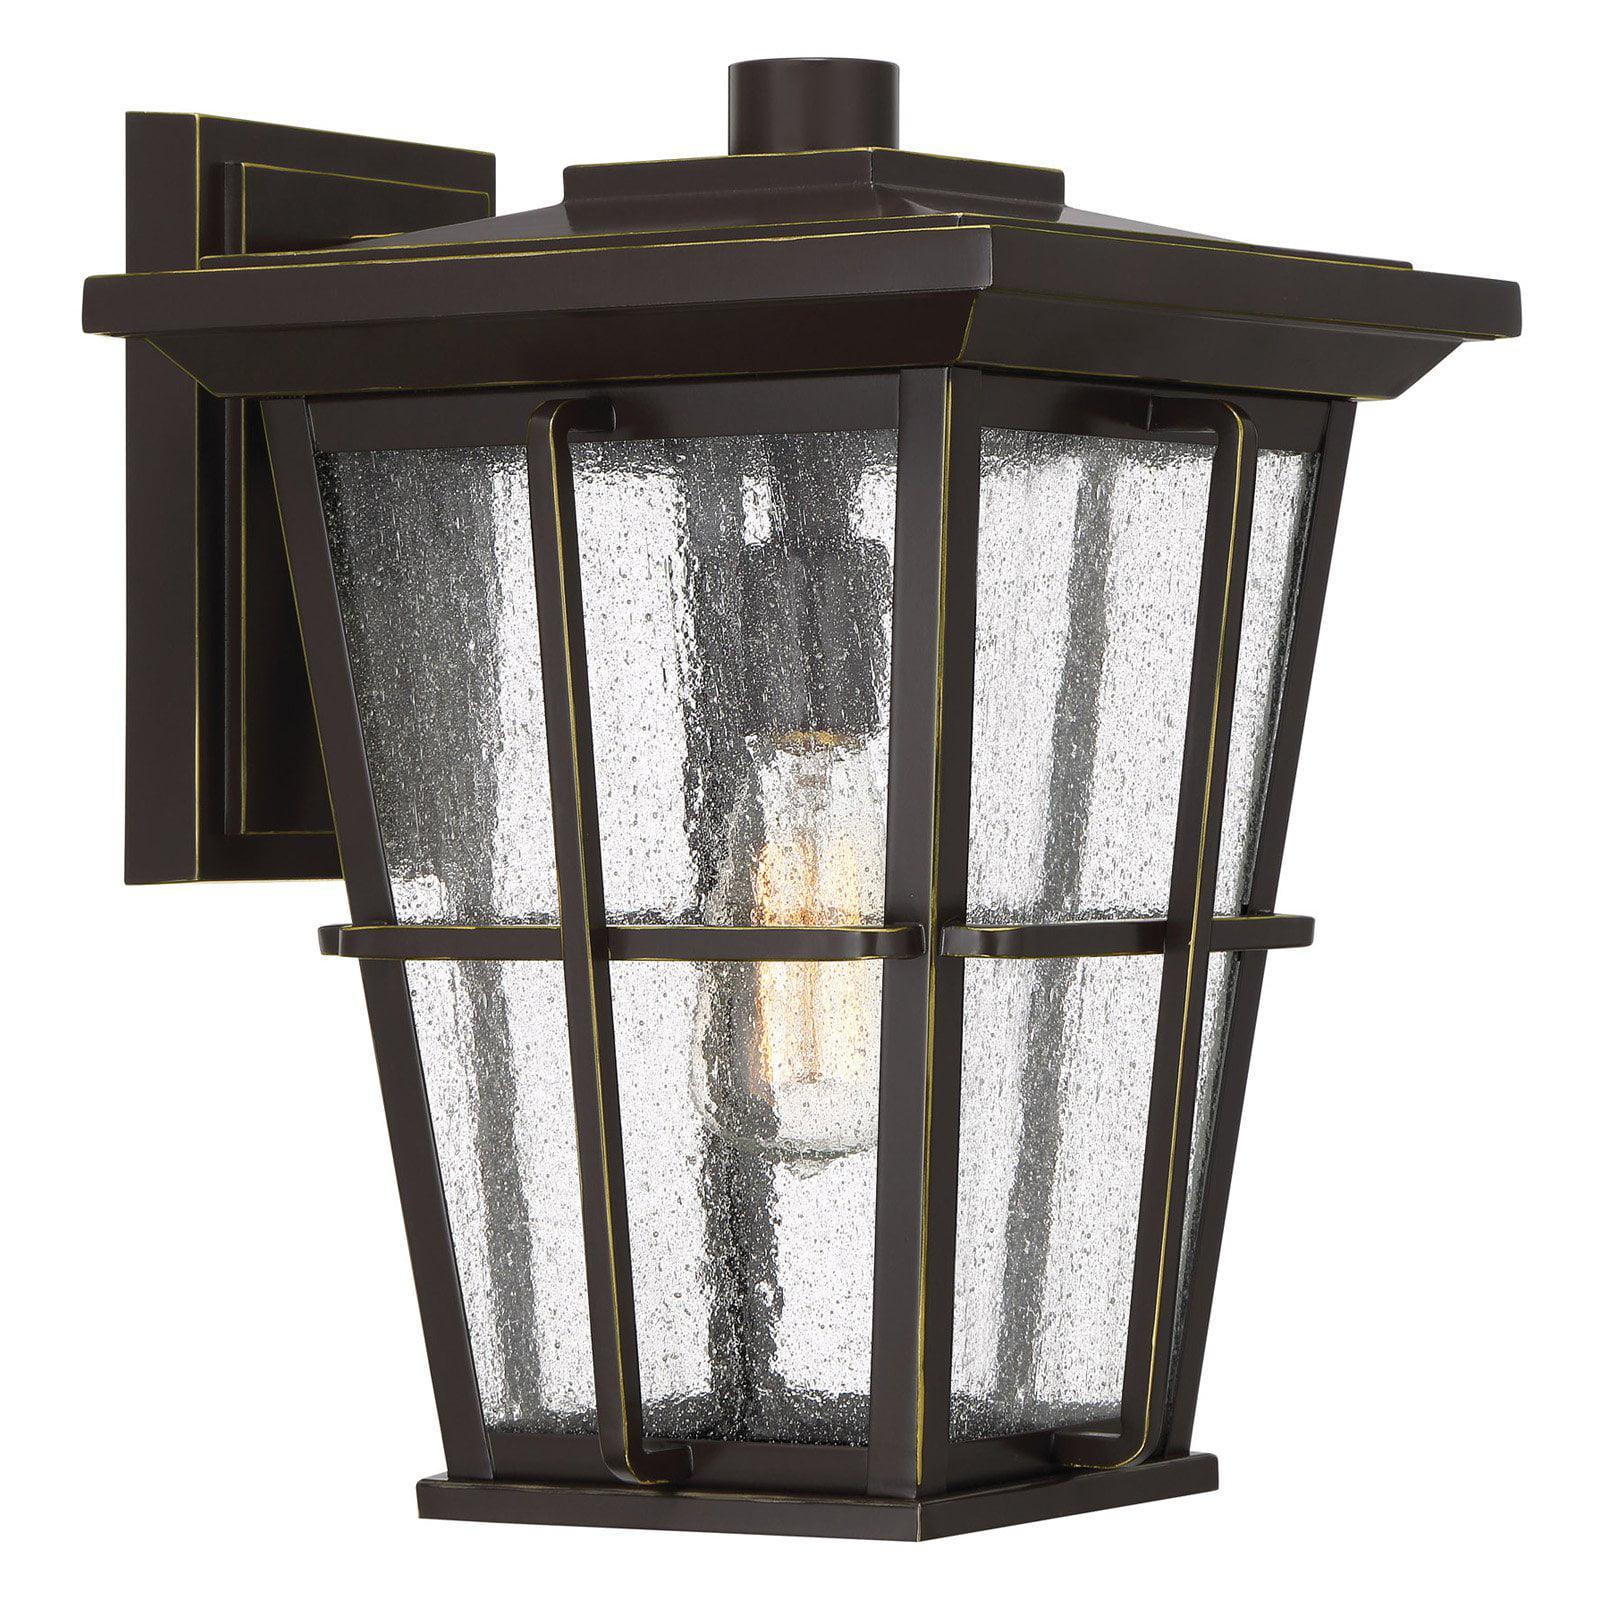 Quoizel Rockport RPT84 Outdoor Wall Lantern